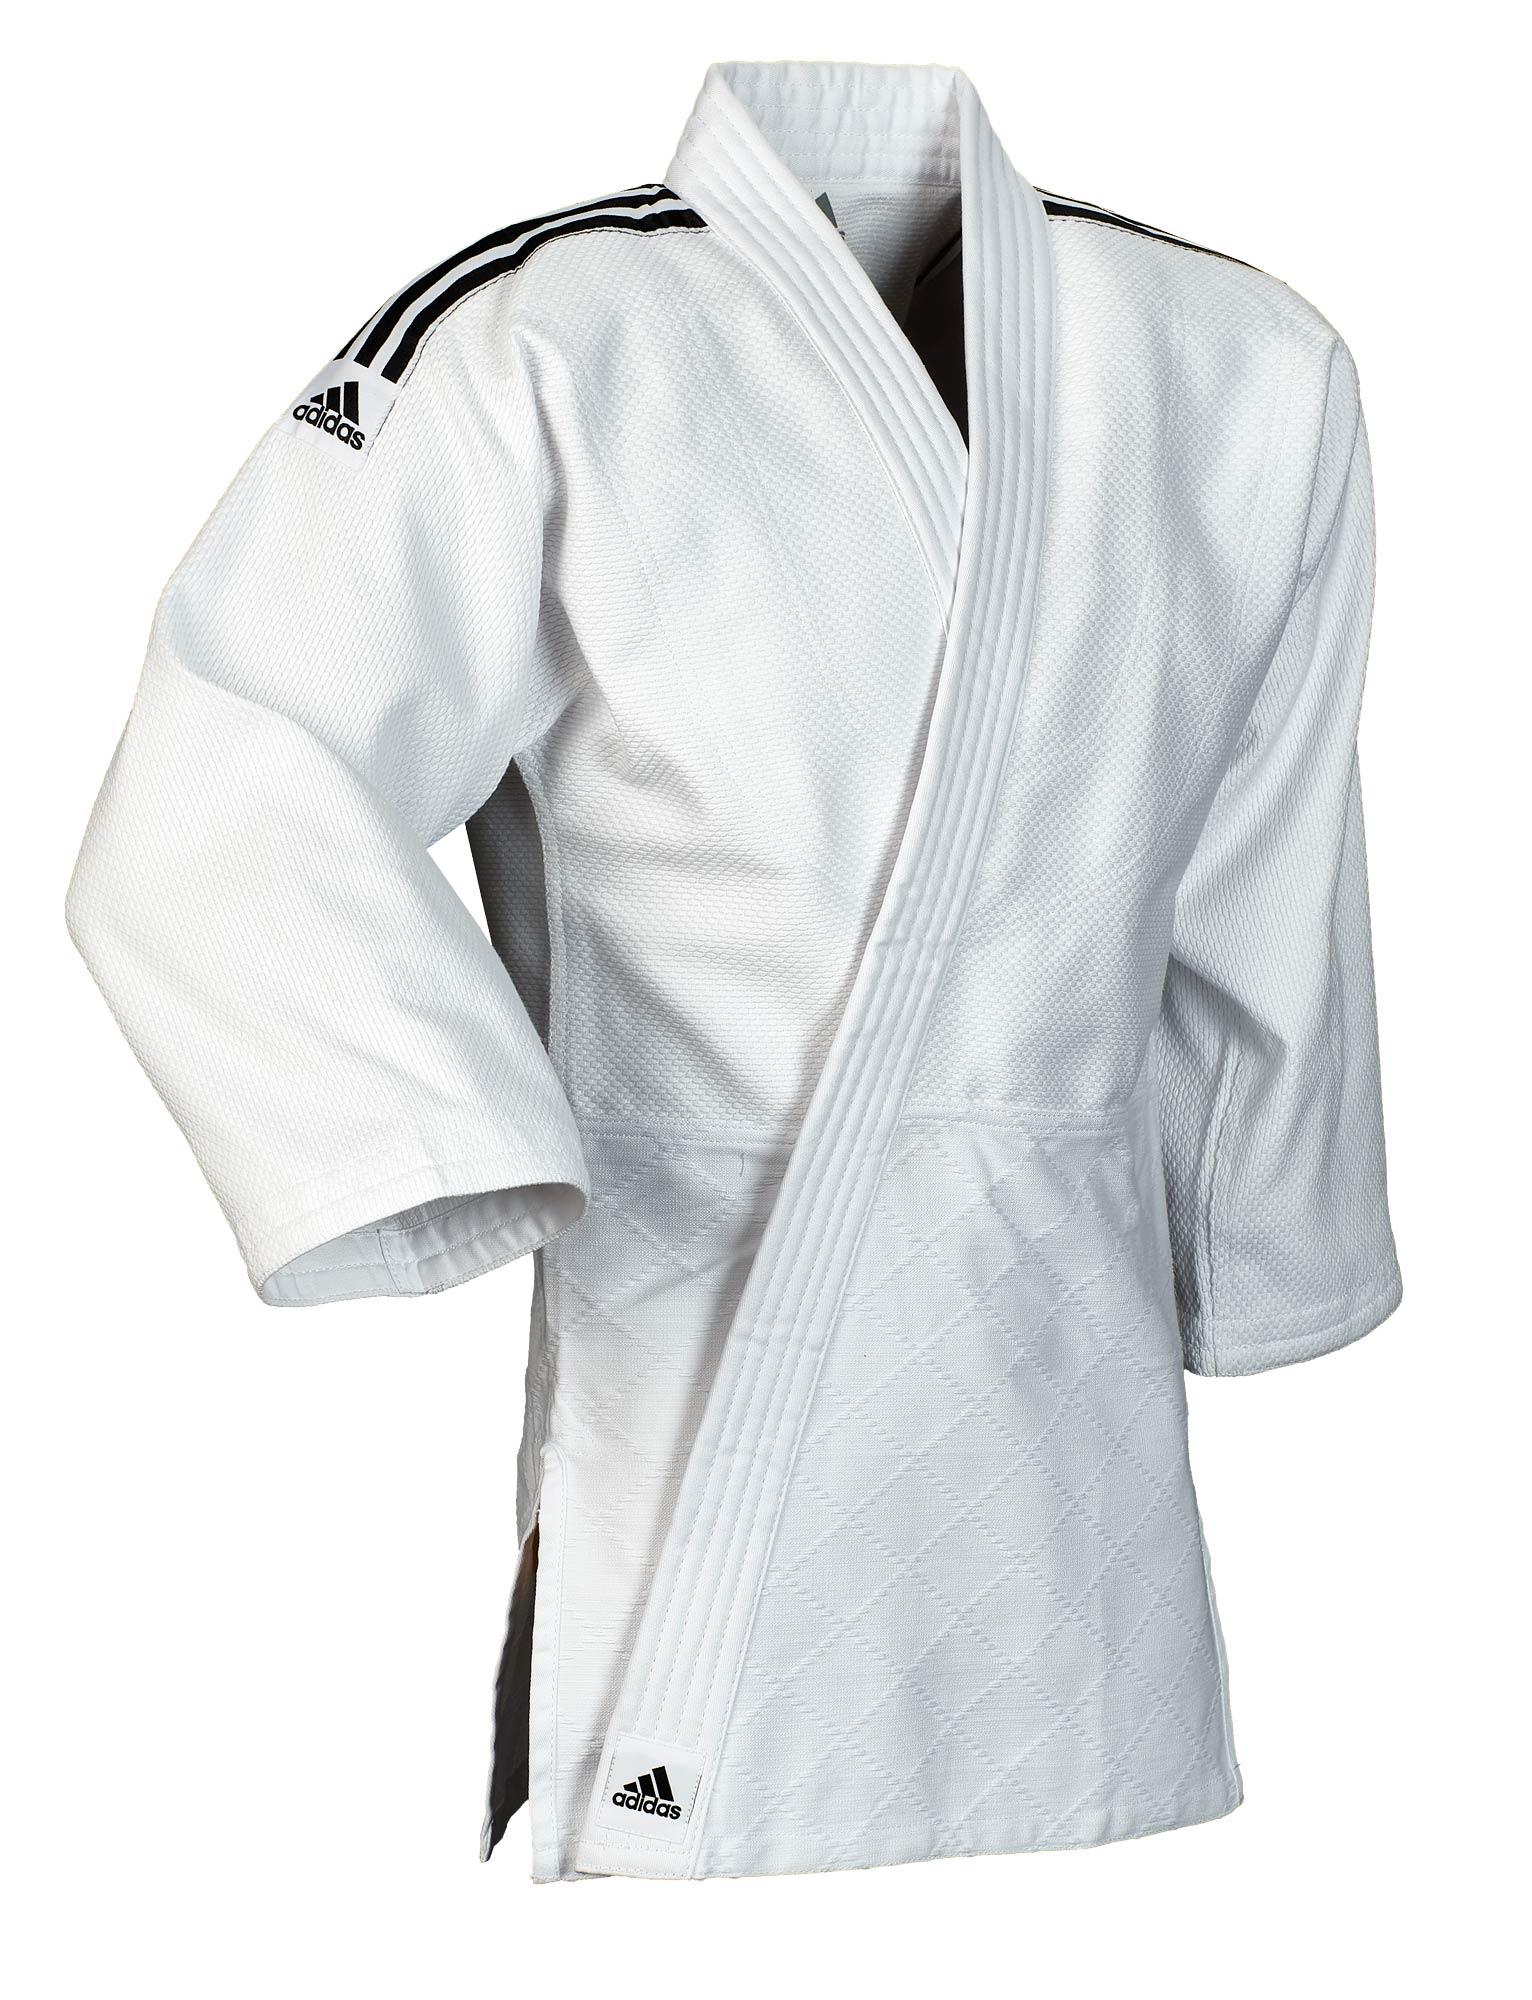 Destello cubo Definitivo  adidas judo gi Training J500 white/black stripes | adidas | Brands |  Ju-Sports